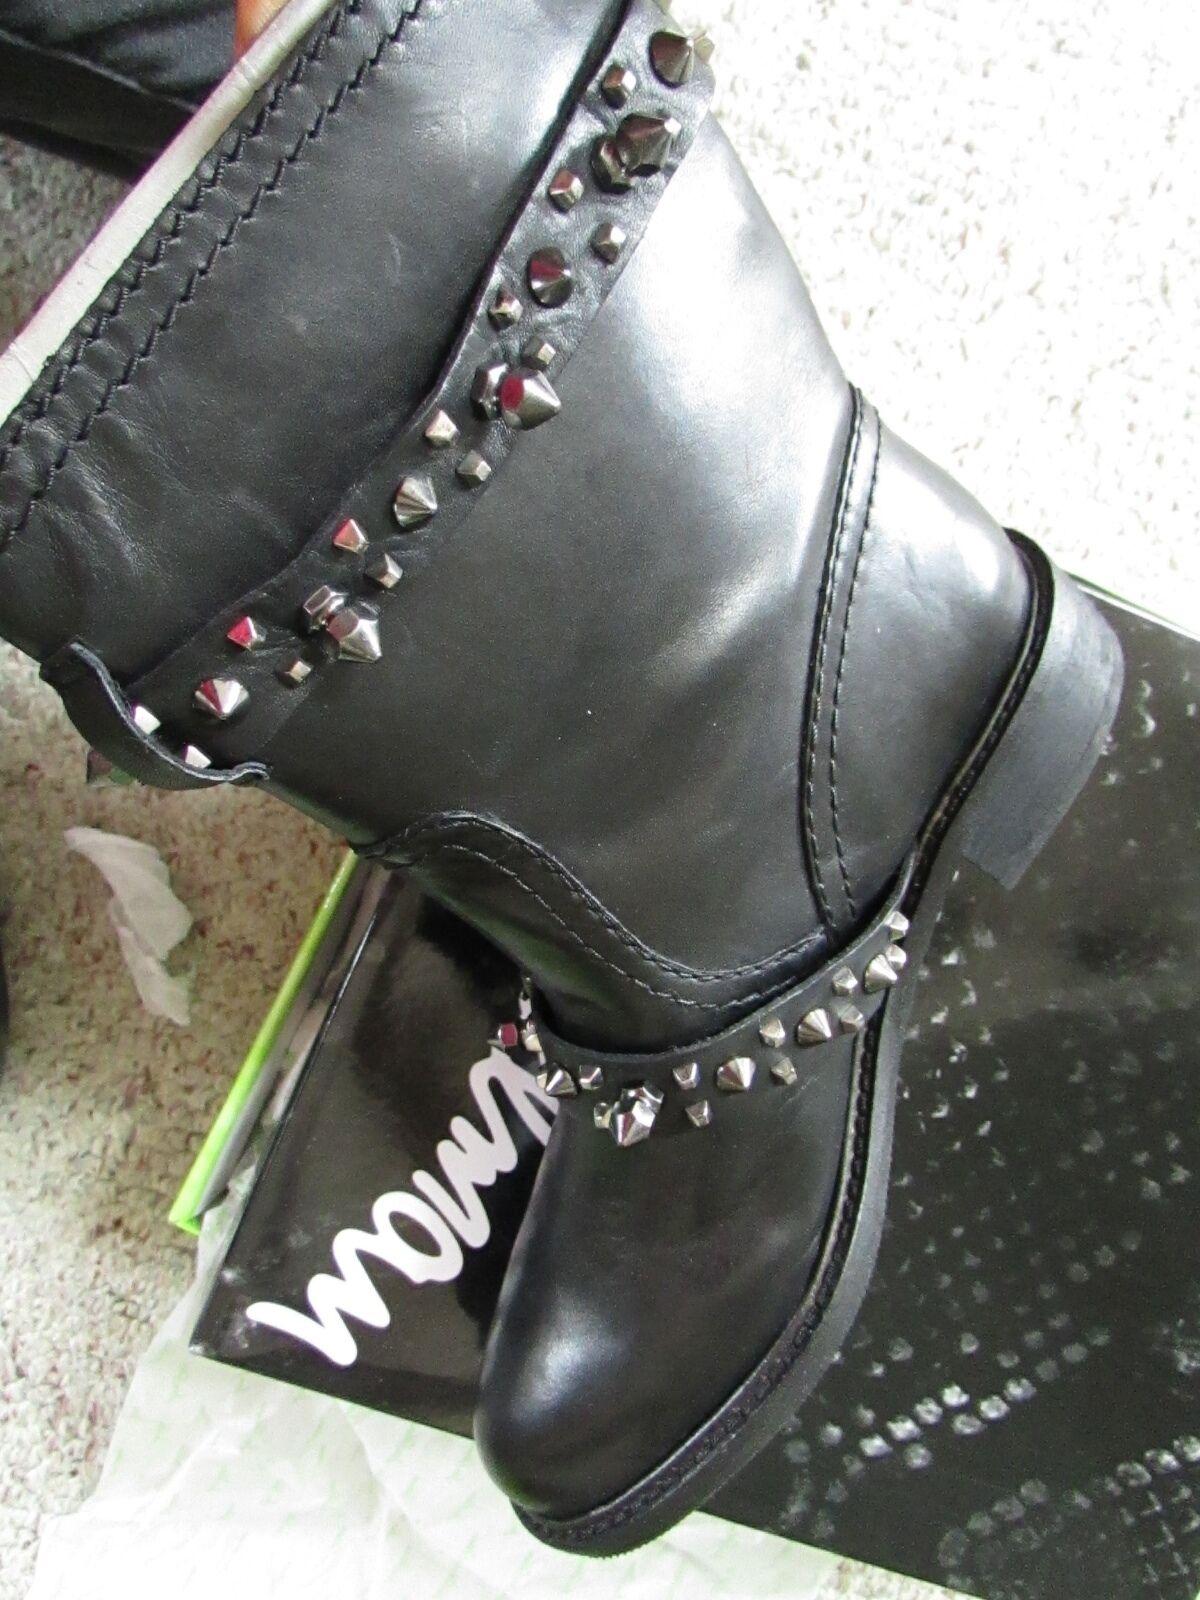 Nueva Sam Edelman Edelman Sam Adele Moto Cuero Negro Botines botas Para Mujer 6 libre Sh 6b2396